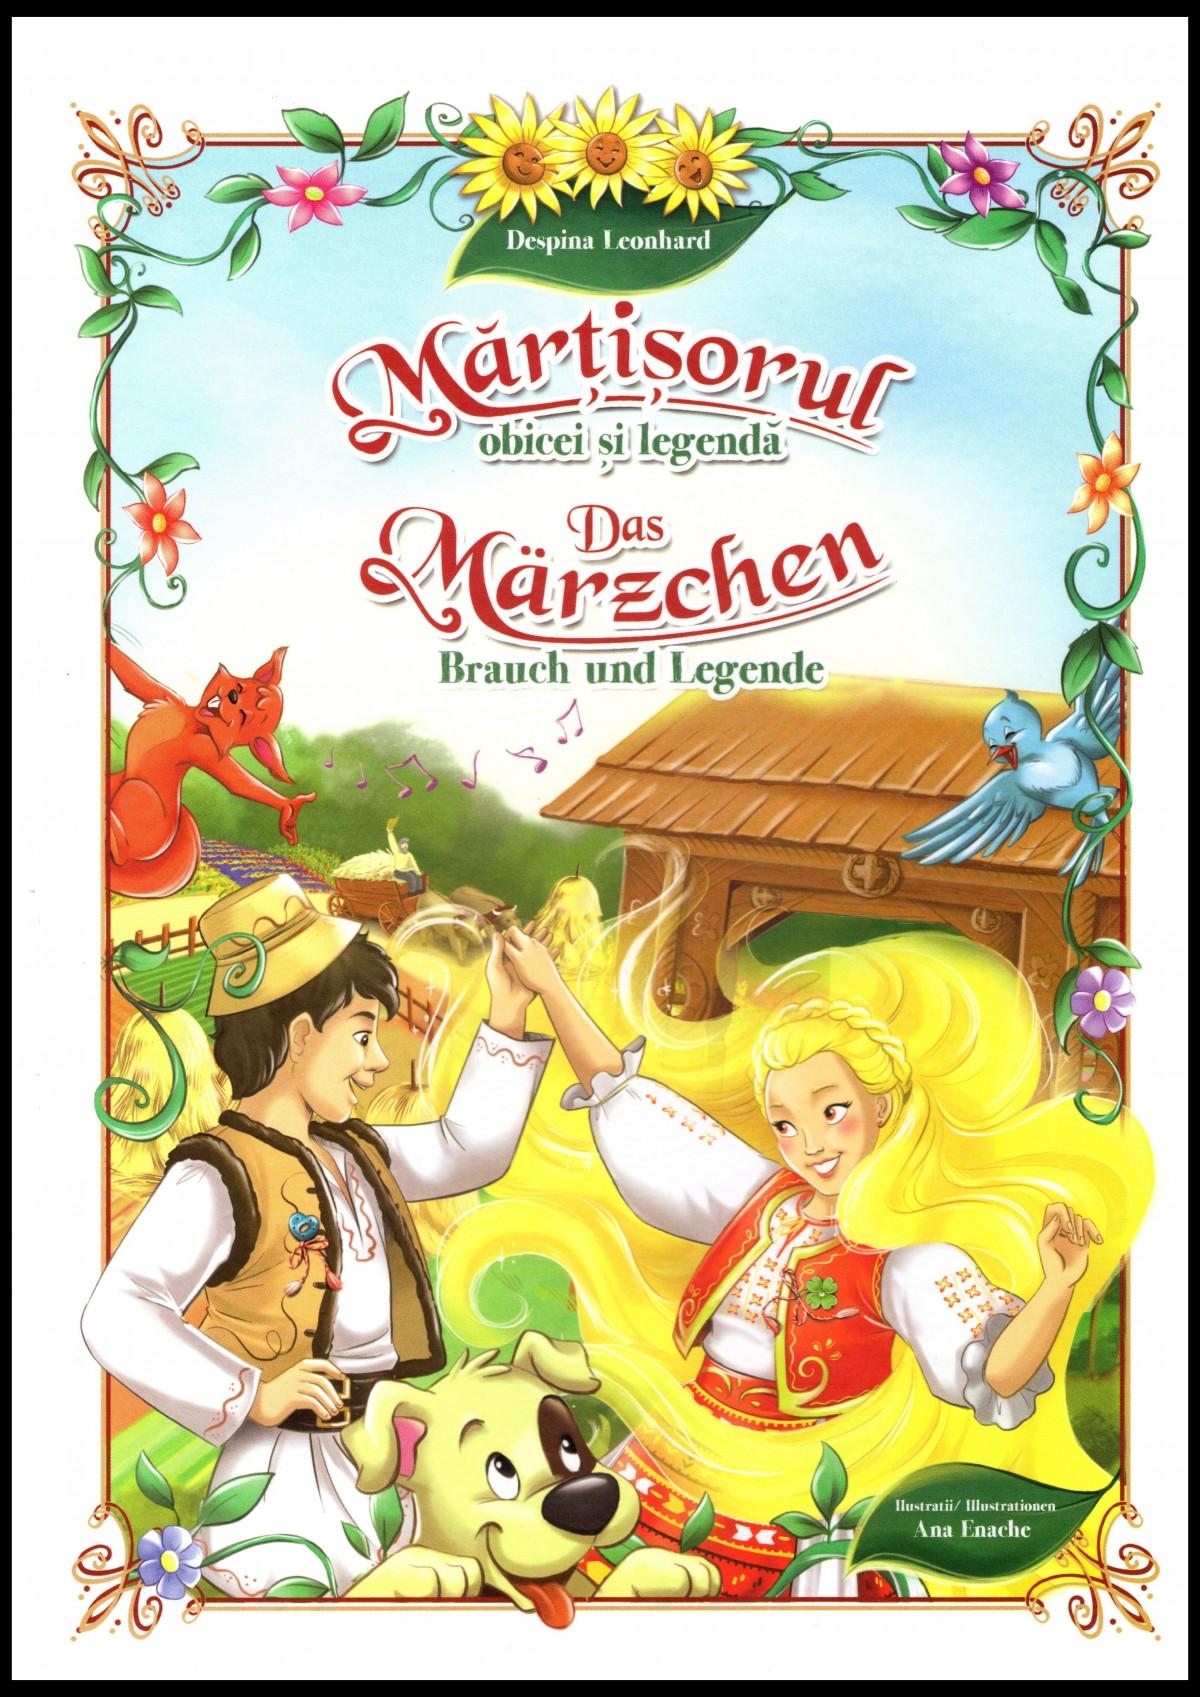 Martisorul: obicei si legenda / Das Märzchen: Brauch und Legende – interviu pentru cititorii Buchuriei cu autoarea, doamna Despina Leonhard